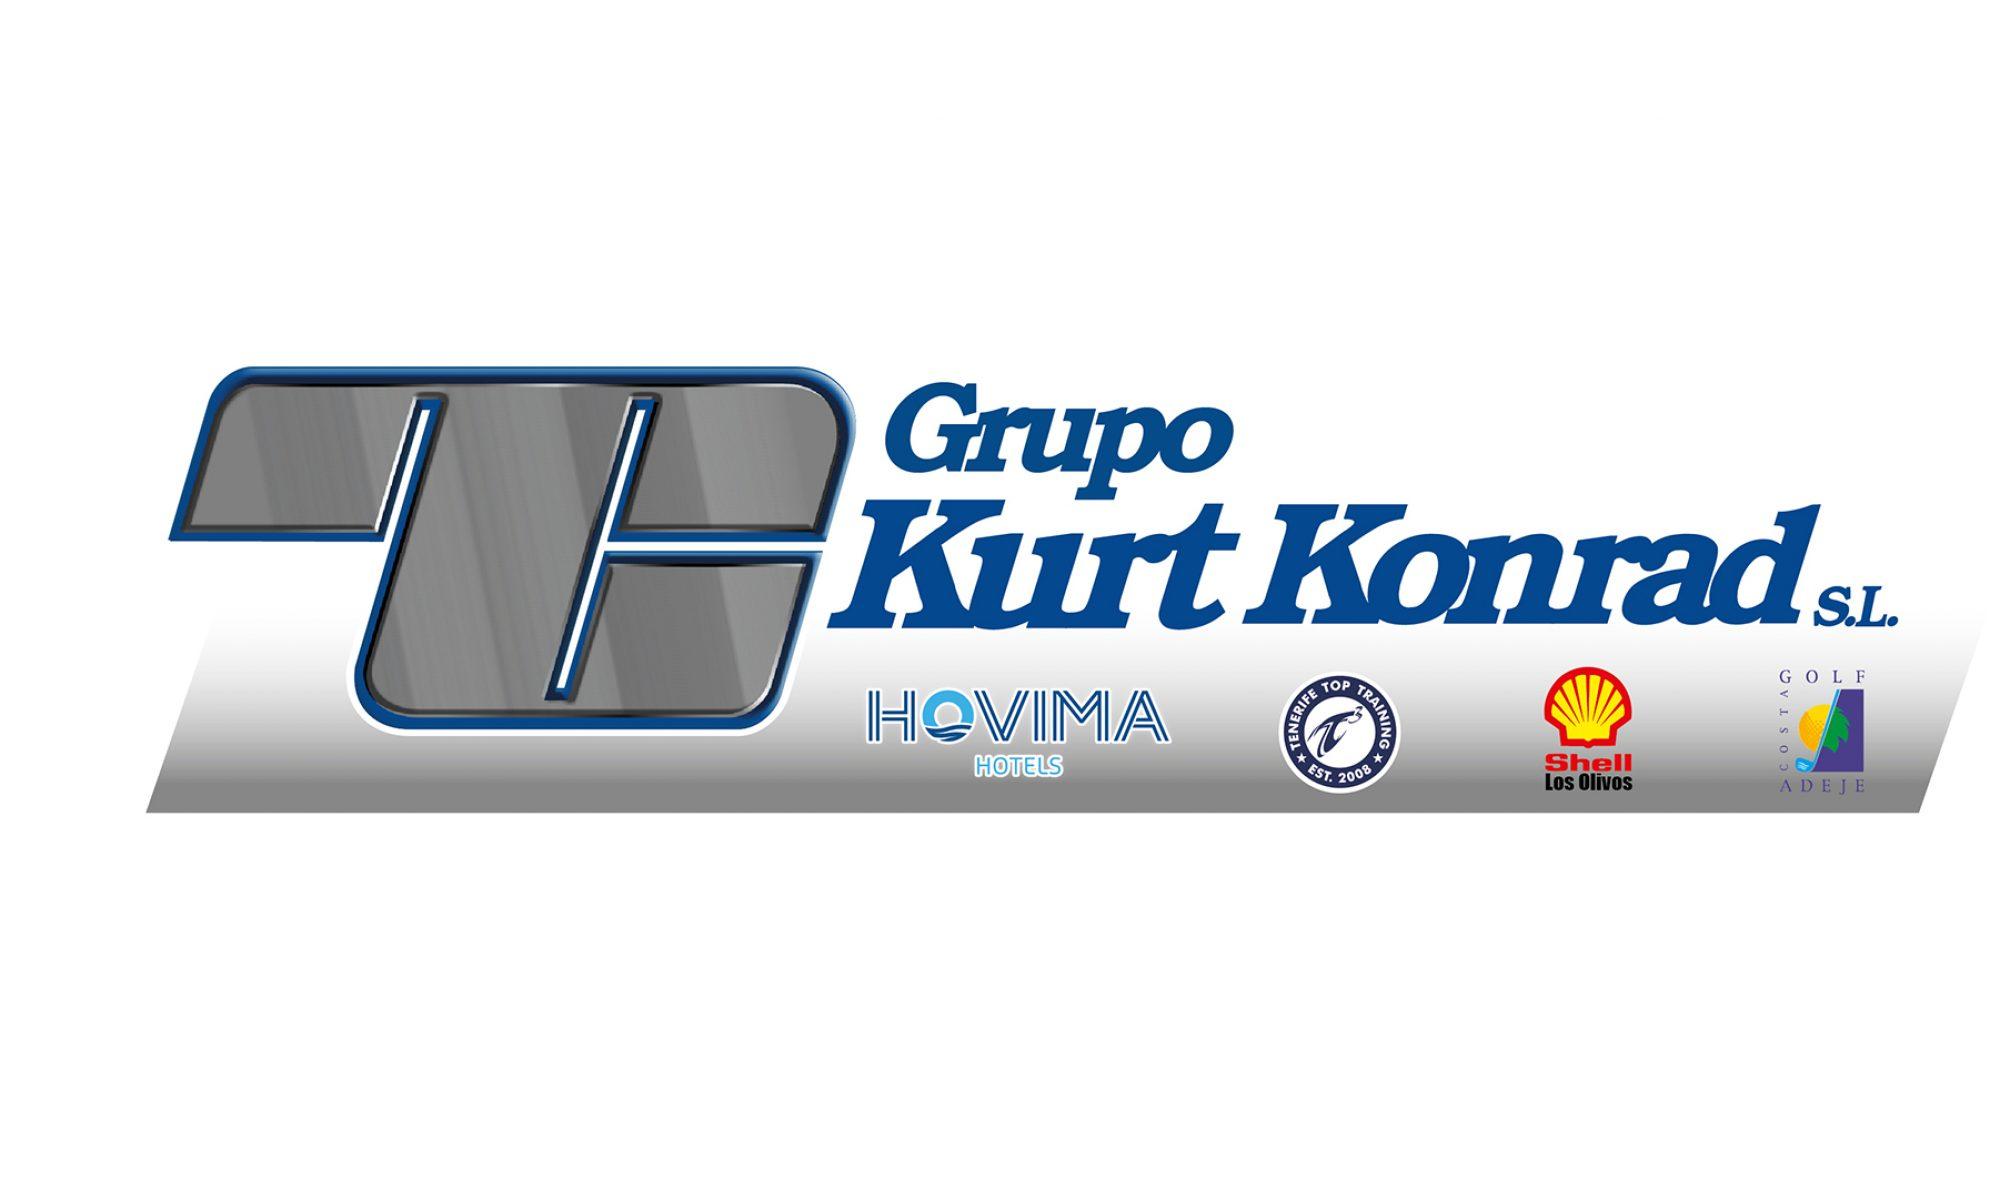 Grupo Kurt Konrad